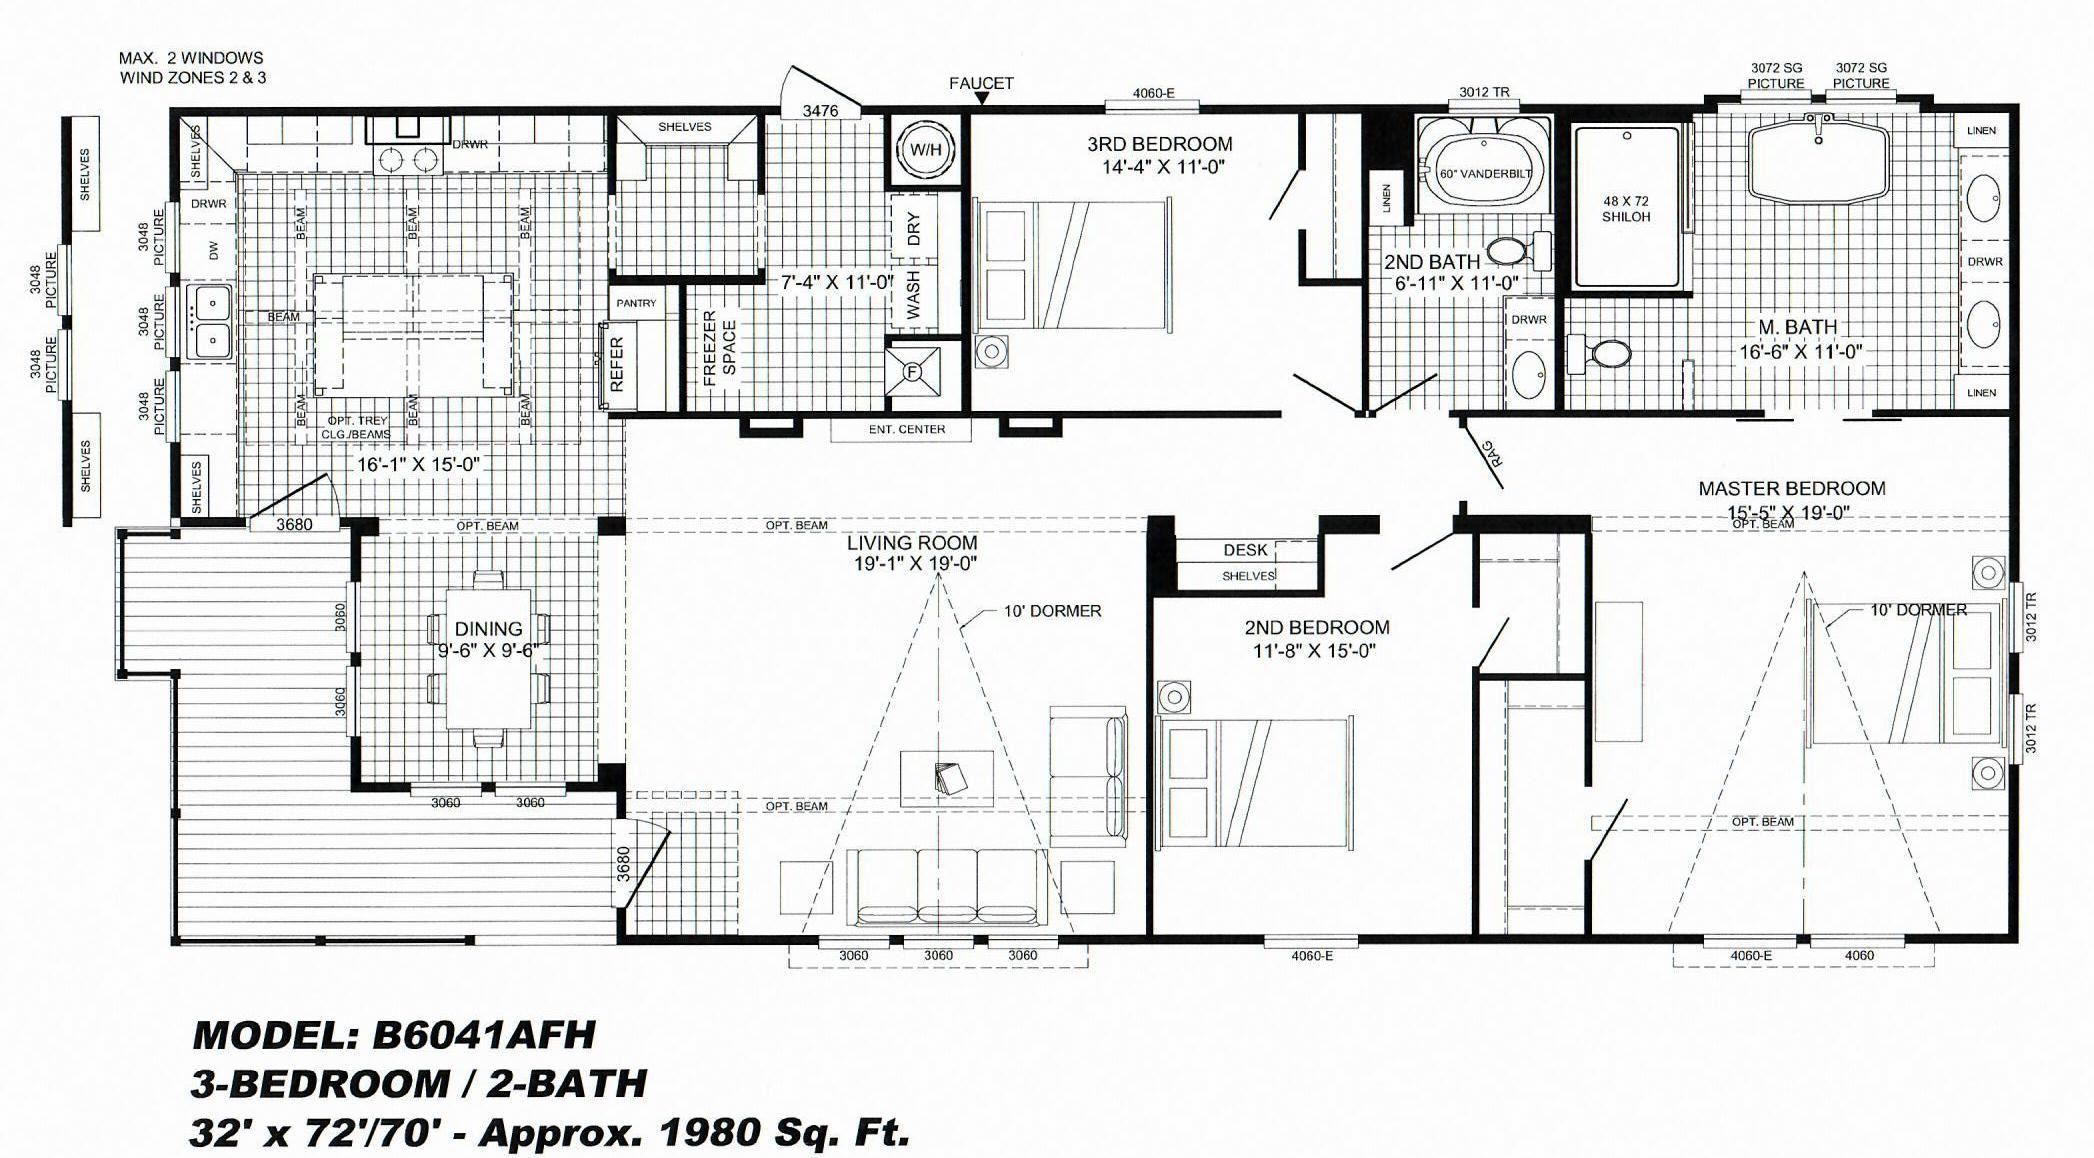 3 Bedroom Floor Plan B 6041 Lulamae Hawks Homes Manufactured Modular Conway Litt Mobile Home Floor Plans Bedroom Floor Plans Farmhouse Floor Plans